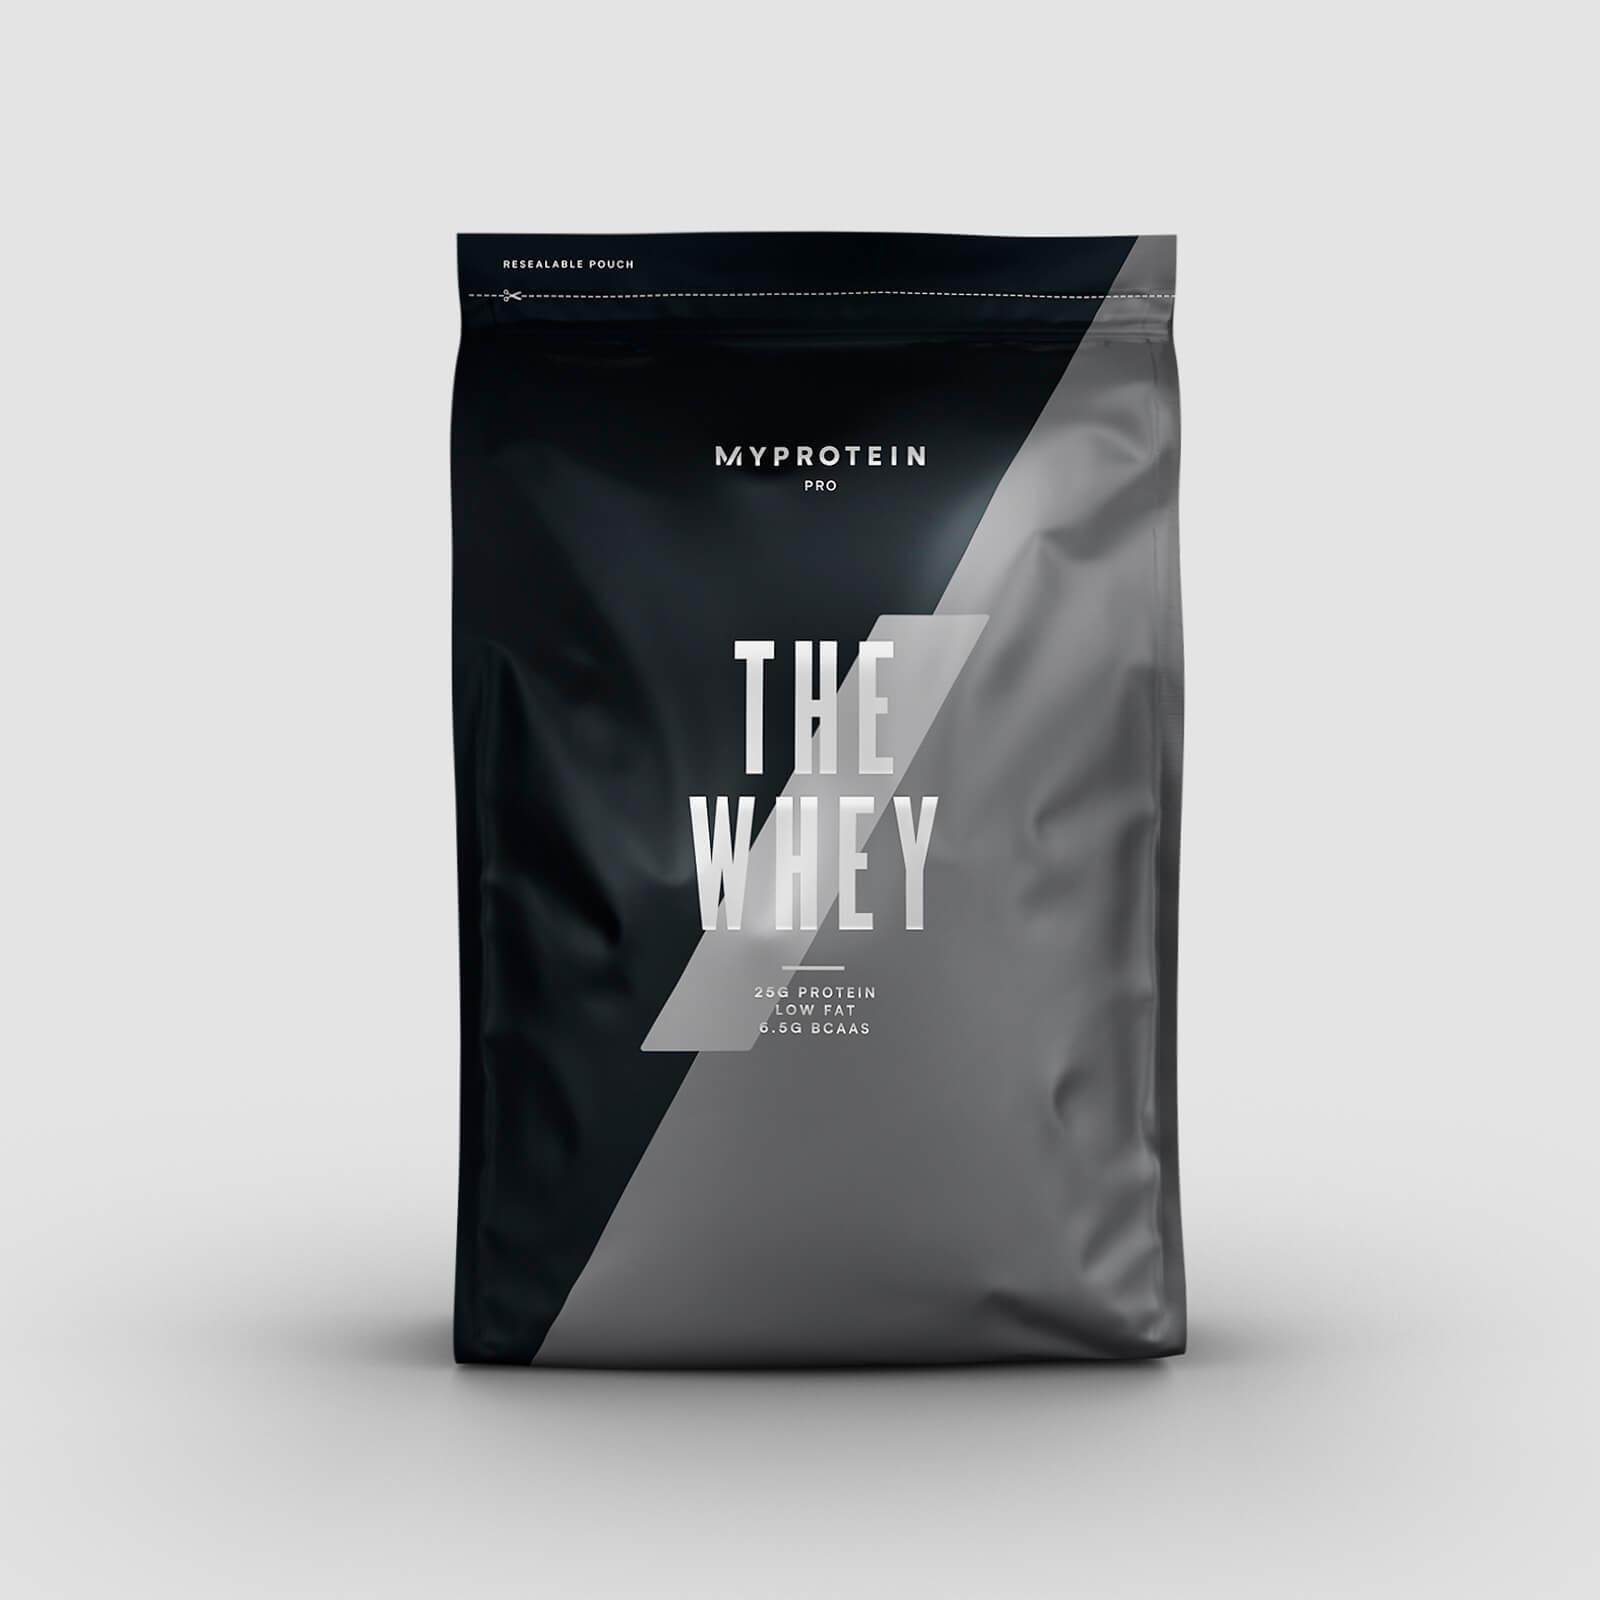 Myprotein THE Whey™ - 100 Servings - 3kg - Chocolat au lait